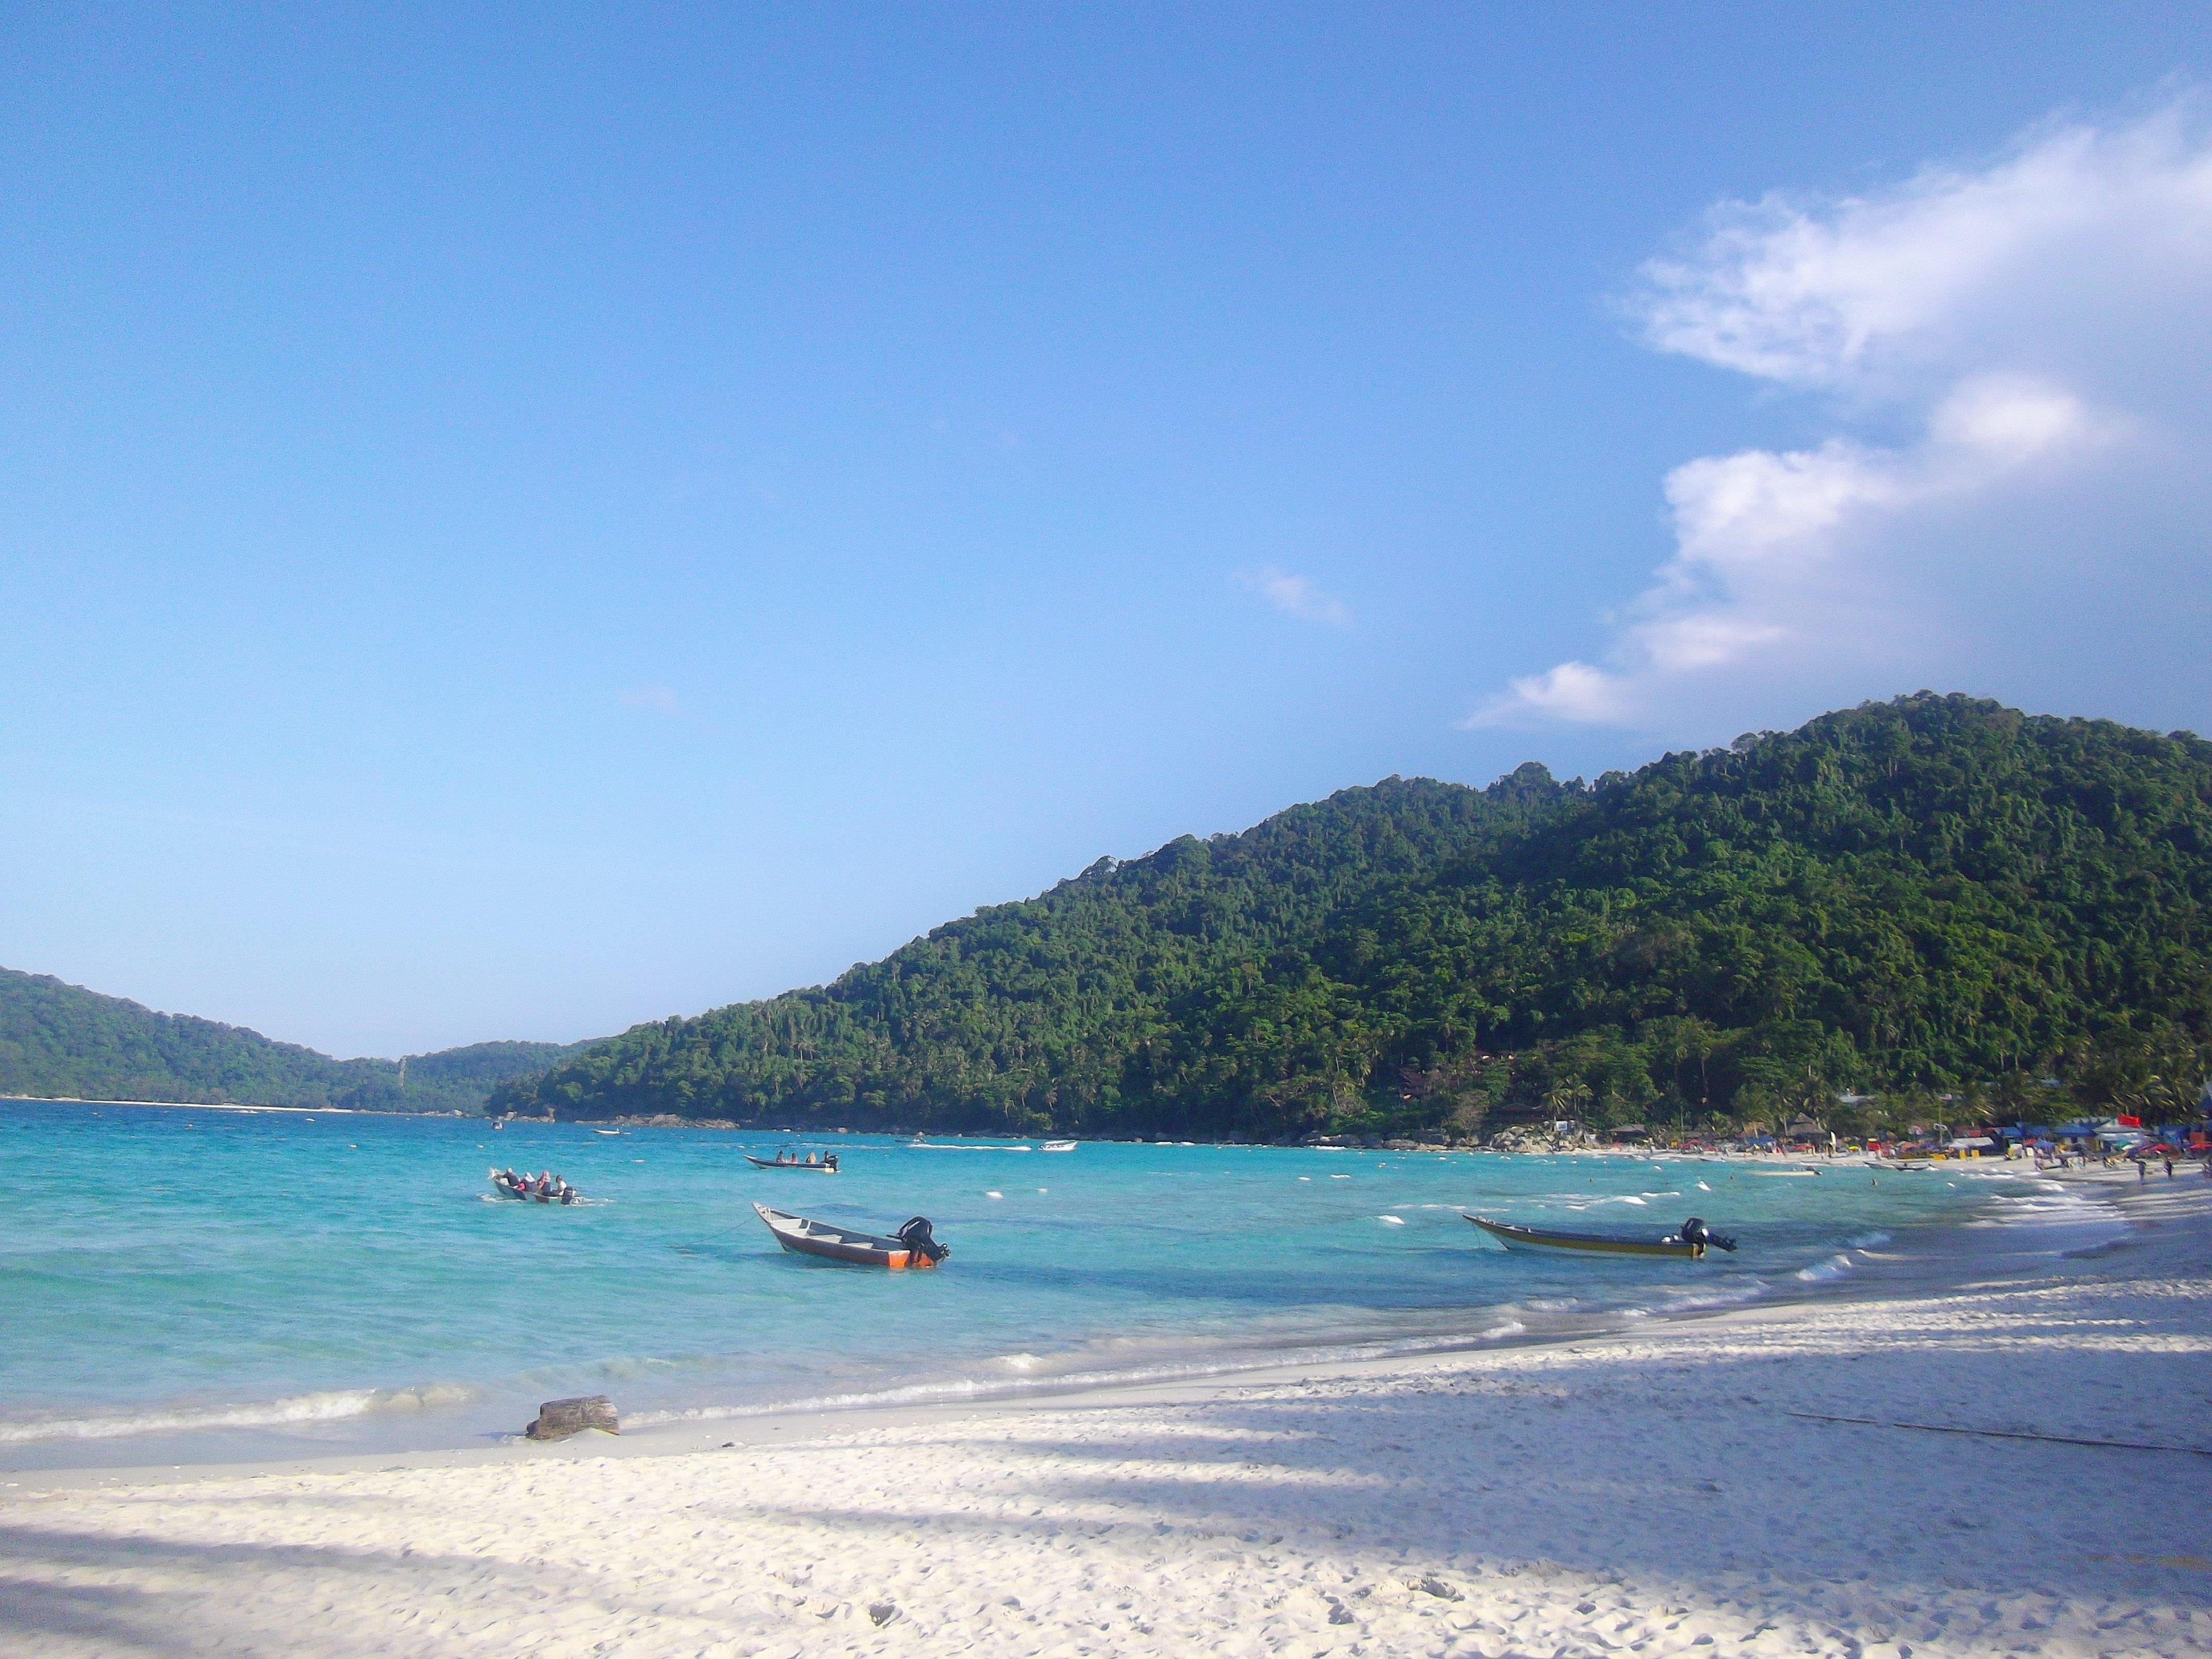 Pulau-perhentian-Kecil-Island-1.jpg